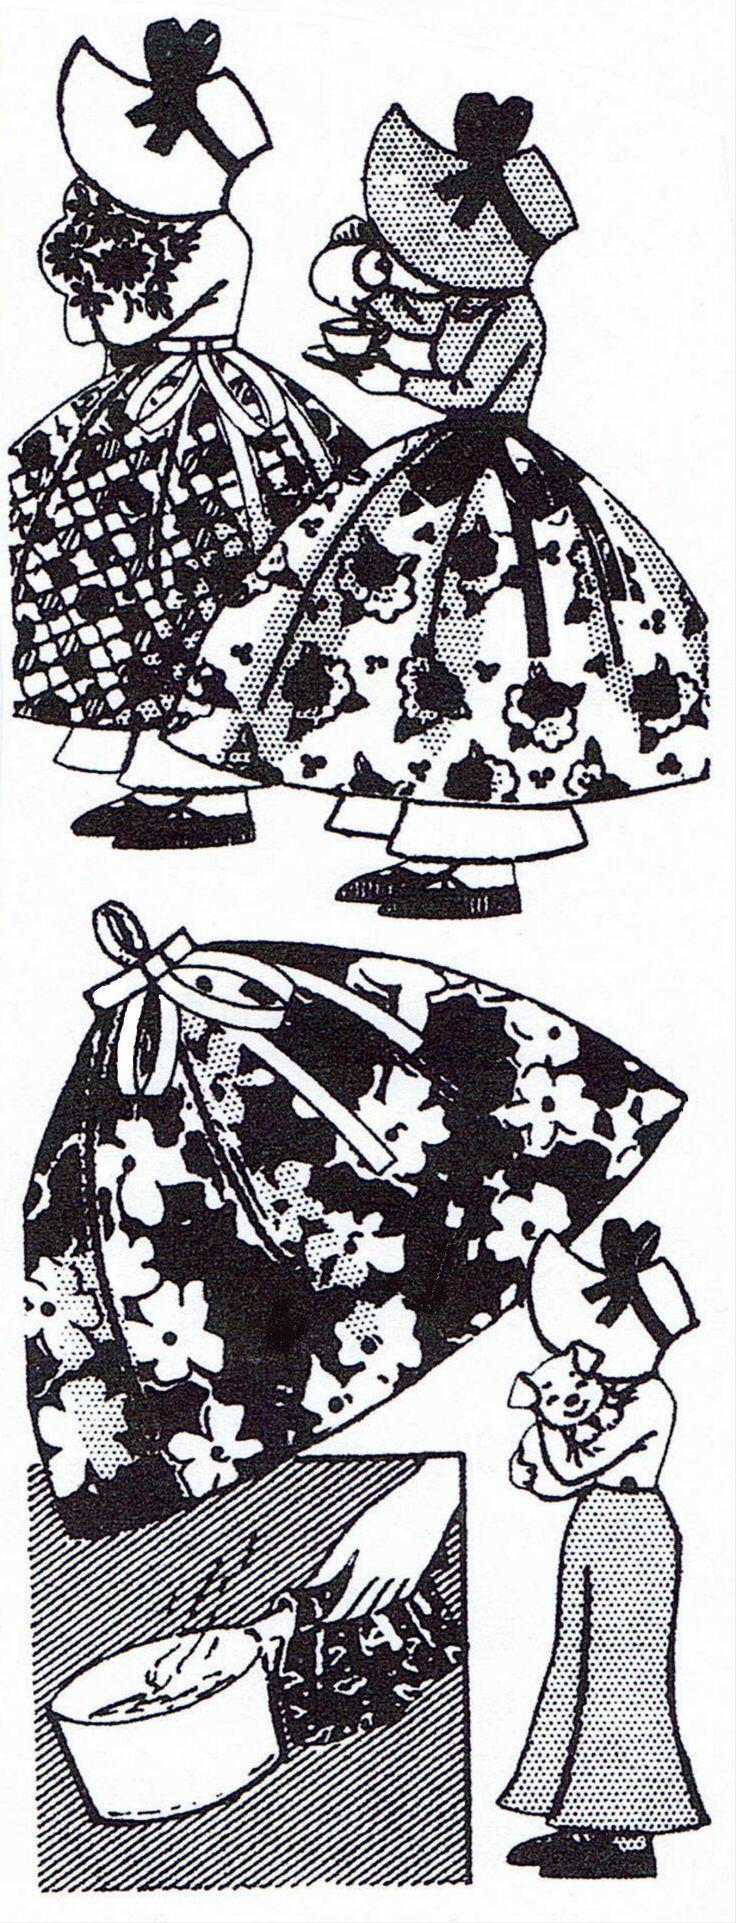 White pot holders for crafts - Pattern Peddler 518 Vintage Mail Order Adorable Sun Bonnet Sue Pot Holders Craft Fabric Material